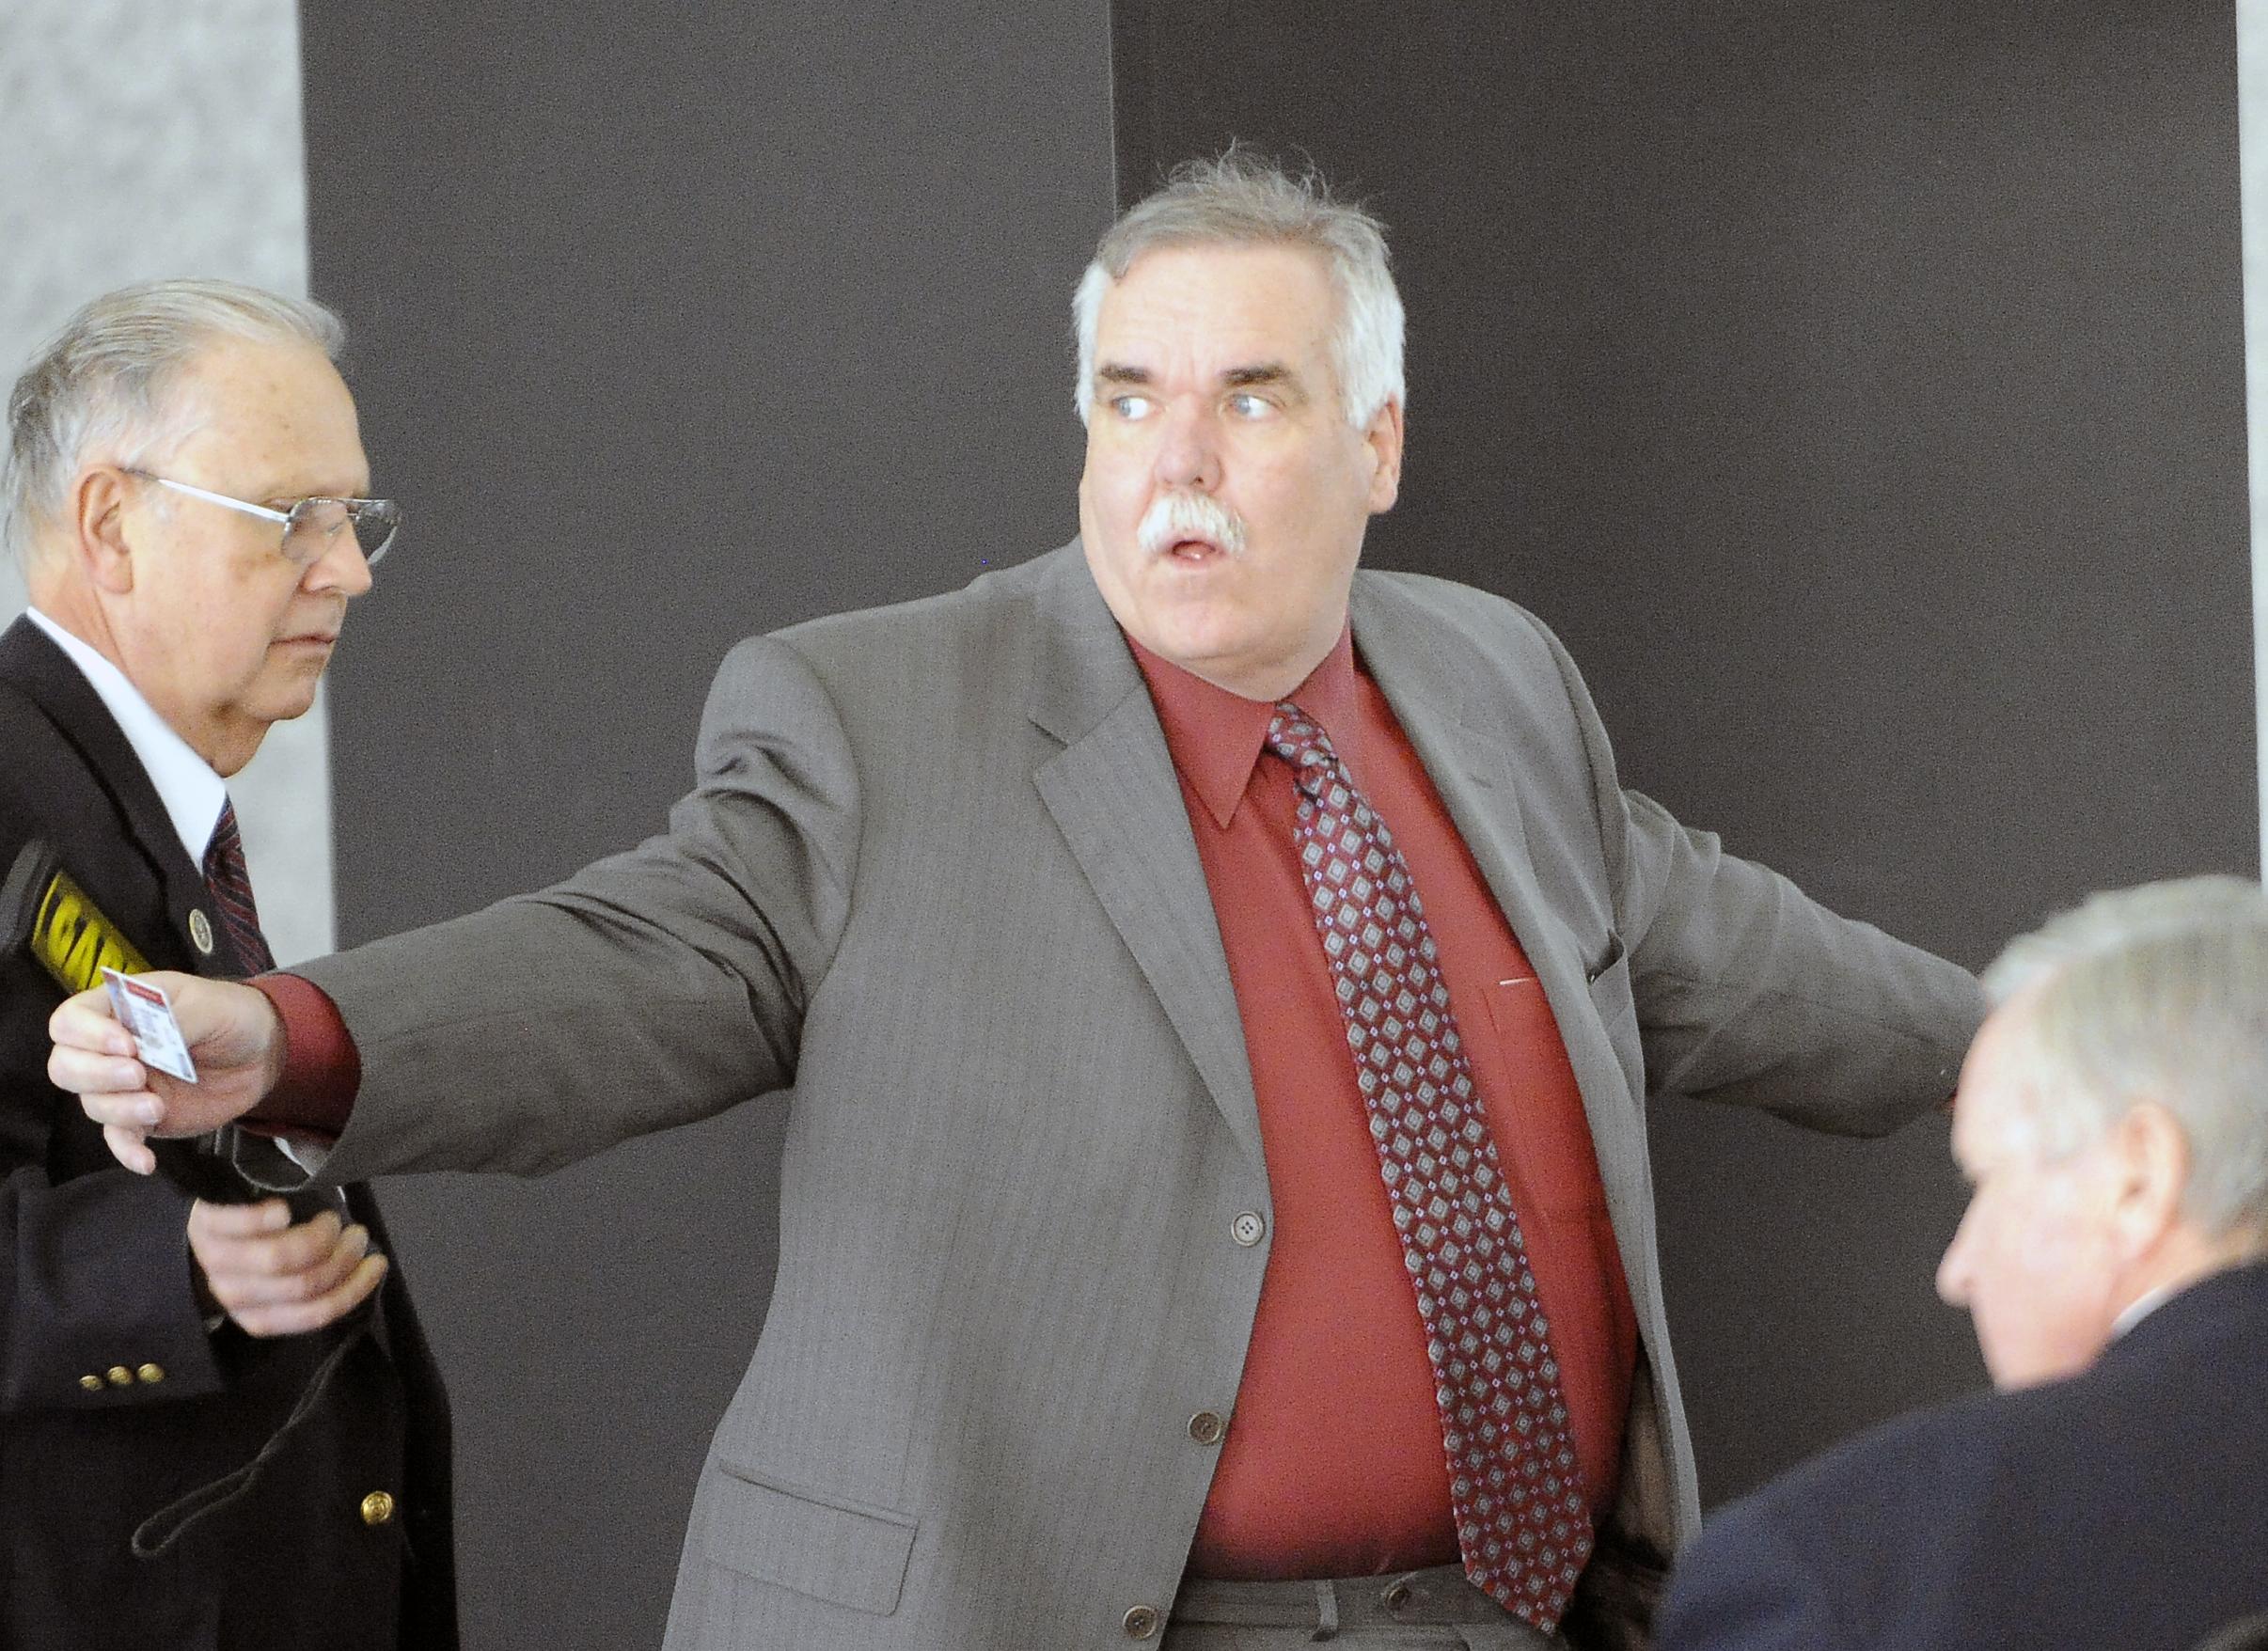 Glenn Lewellen arrives for his trial at Dirksen Federal Building in 2011.